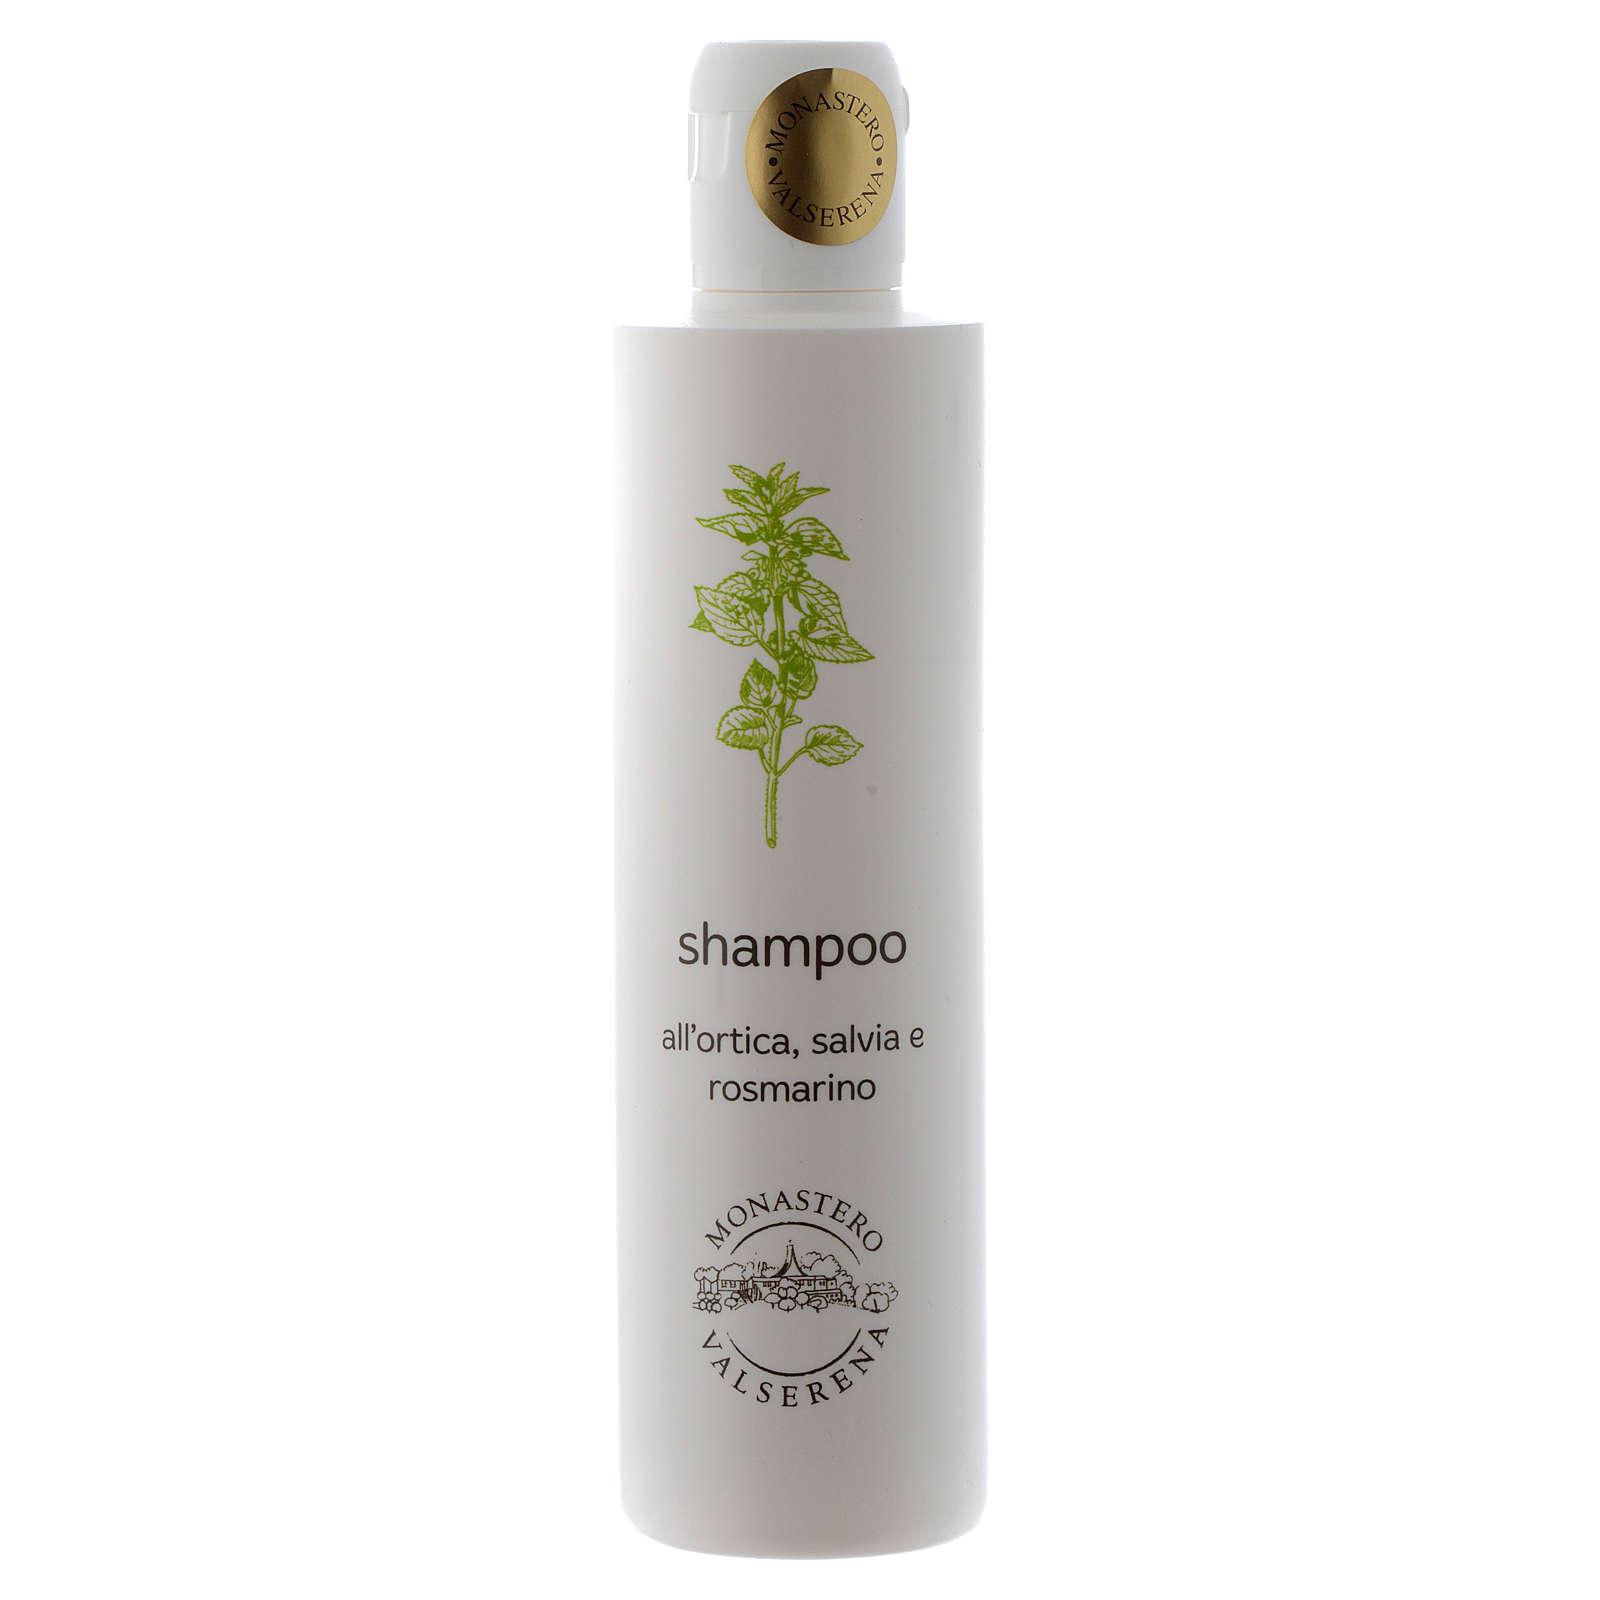 Nettle Sage Rosemary shampoo 250ml 4